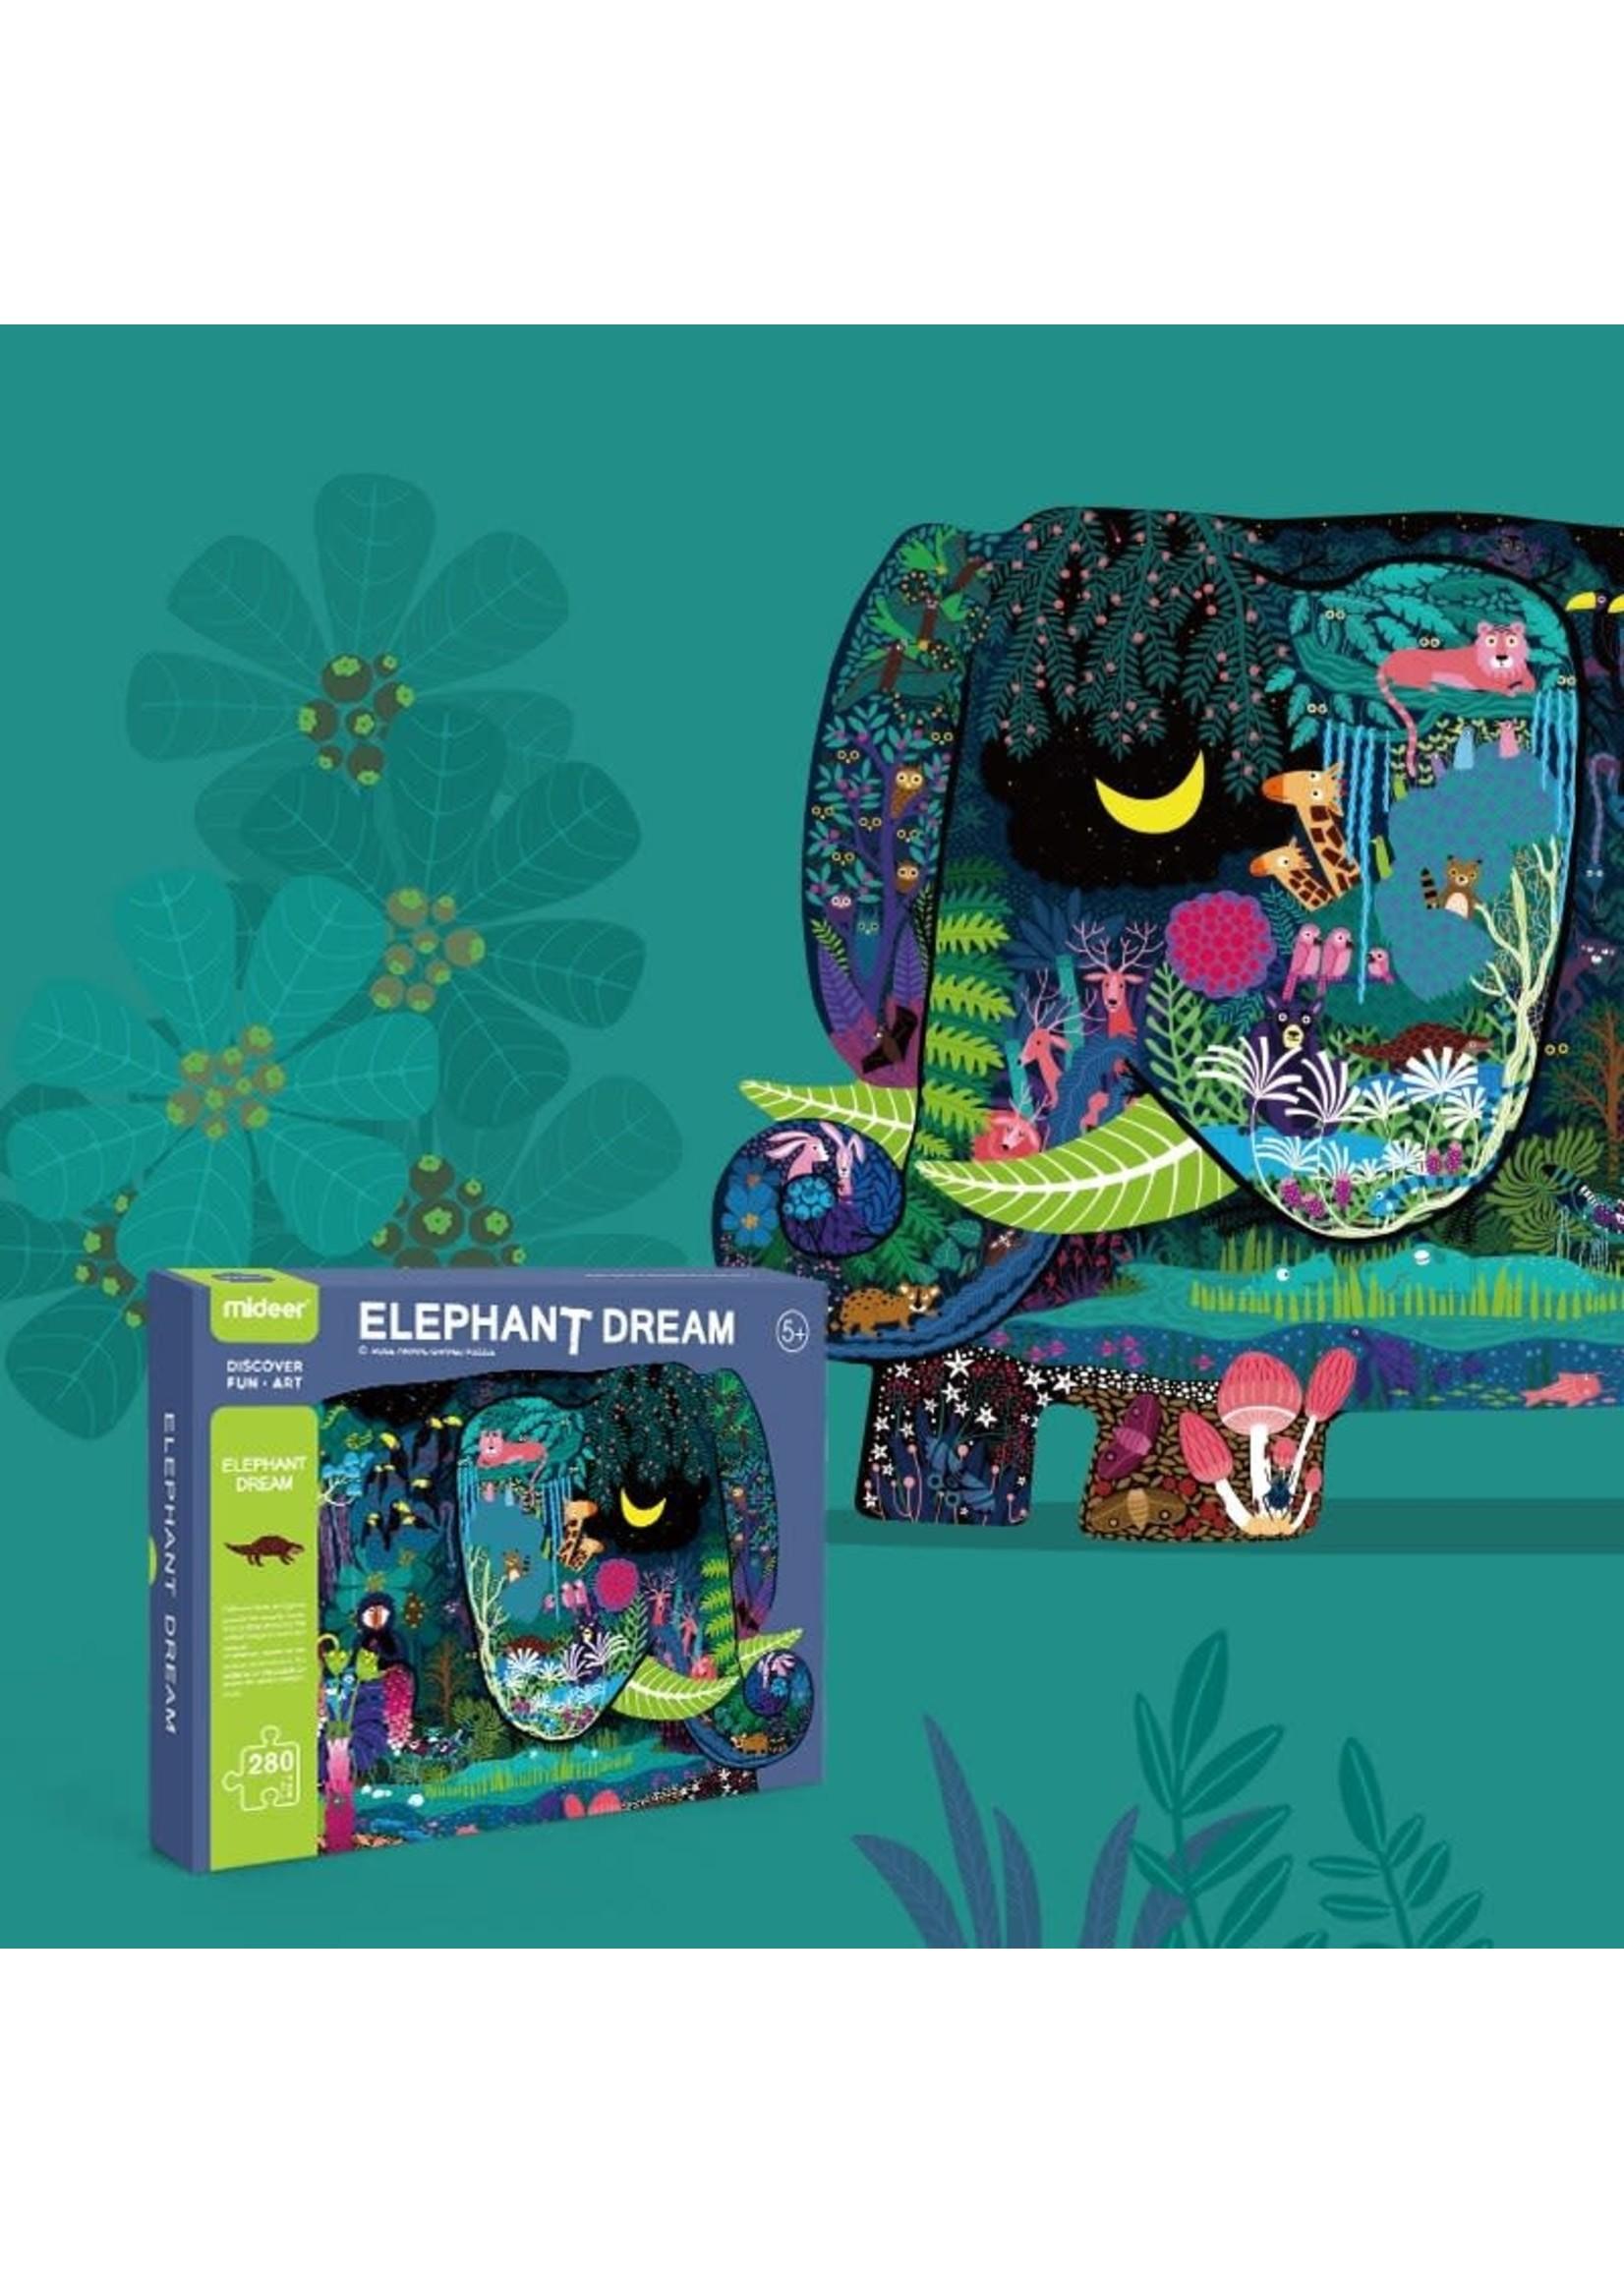 Mideer Mideer Elephant Dream Puzzle (280pc)